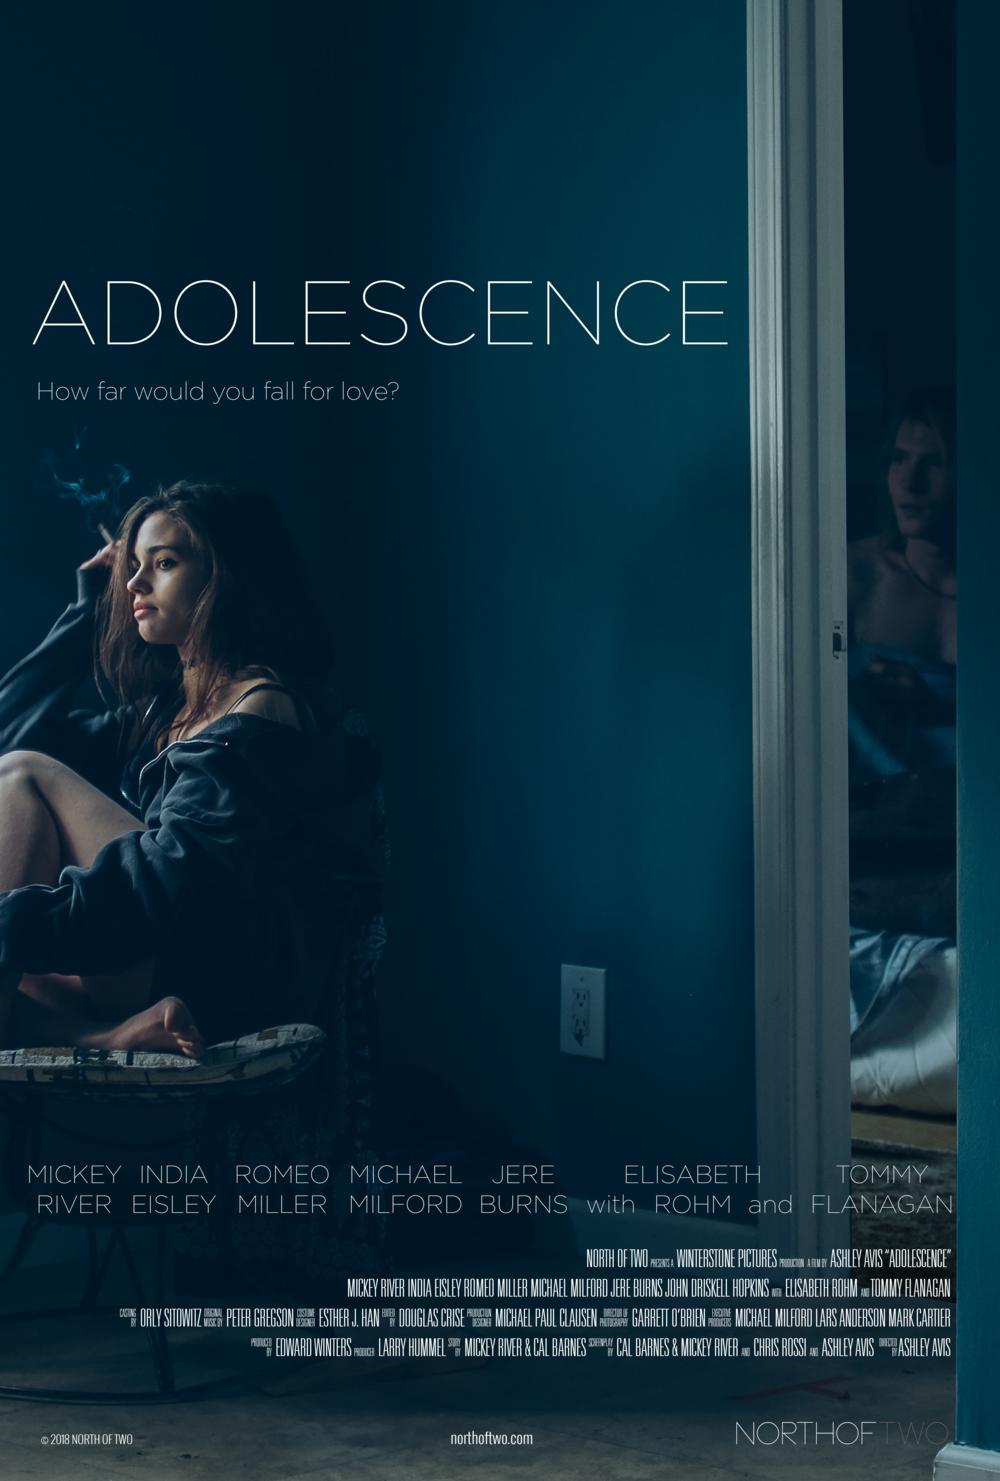 AdolescencePOSTER_nofilmbycredit.png